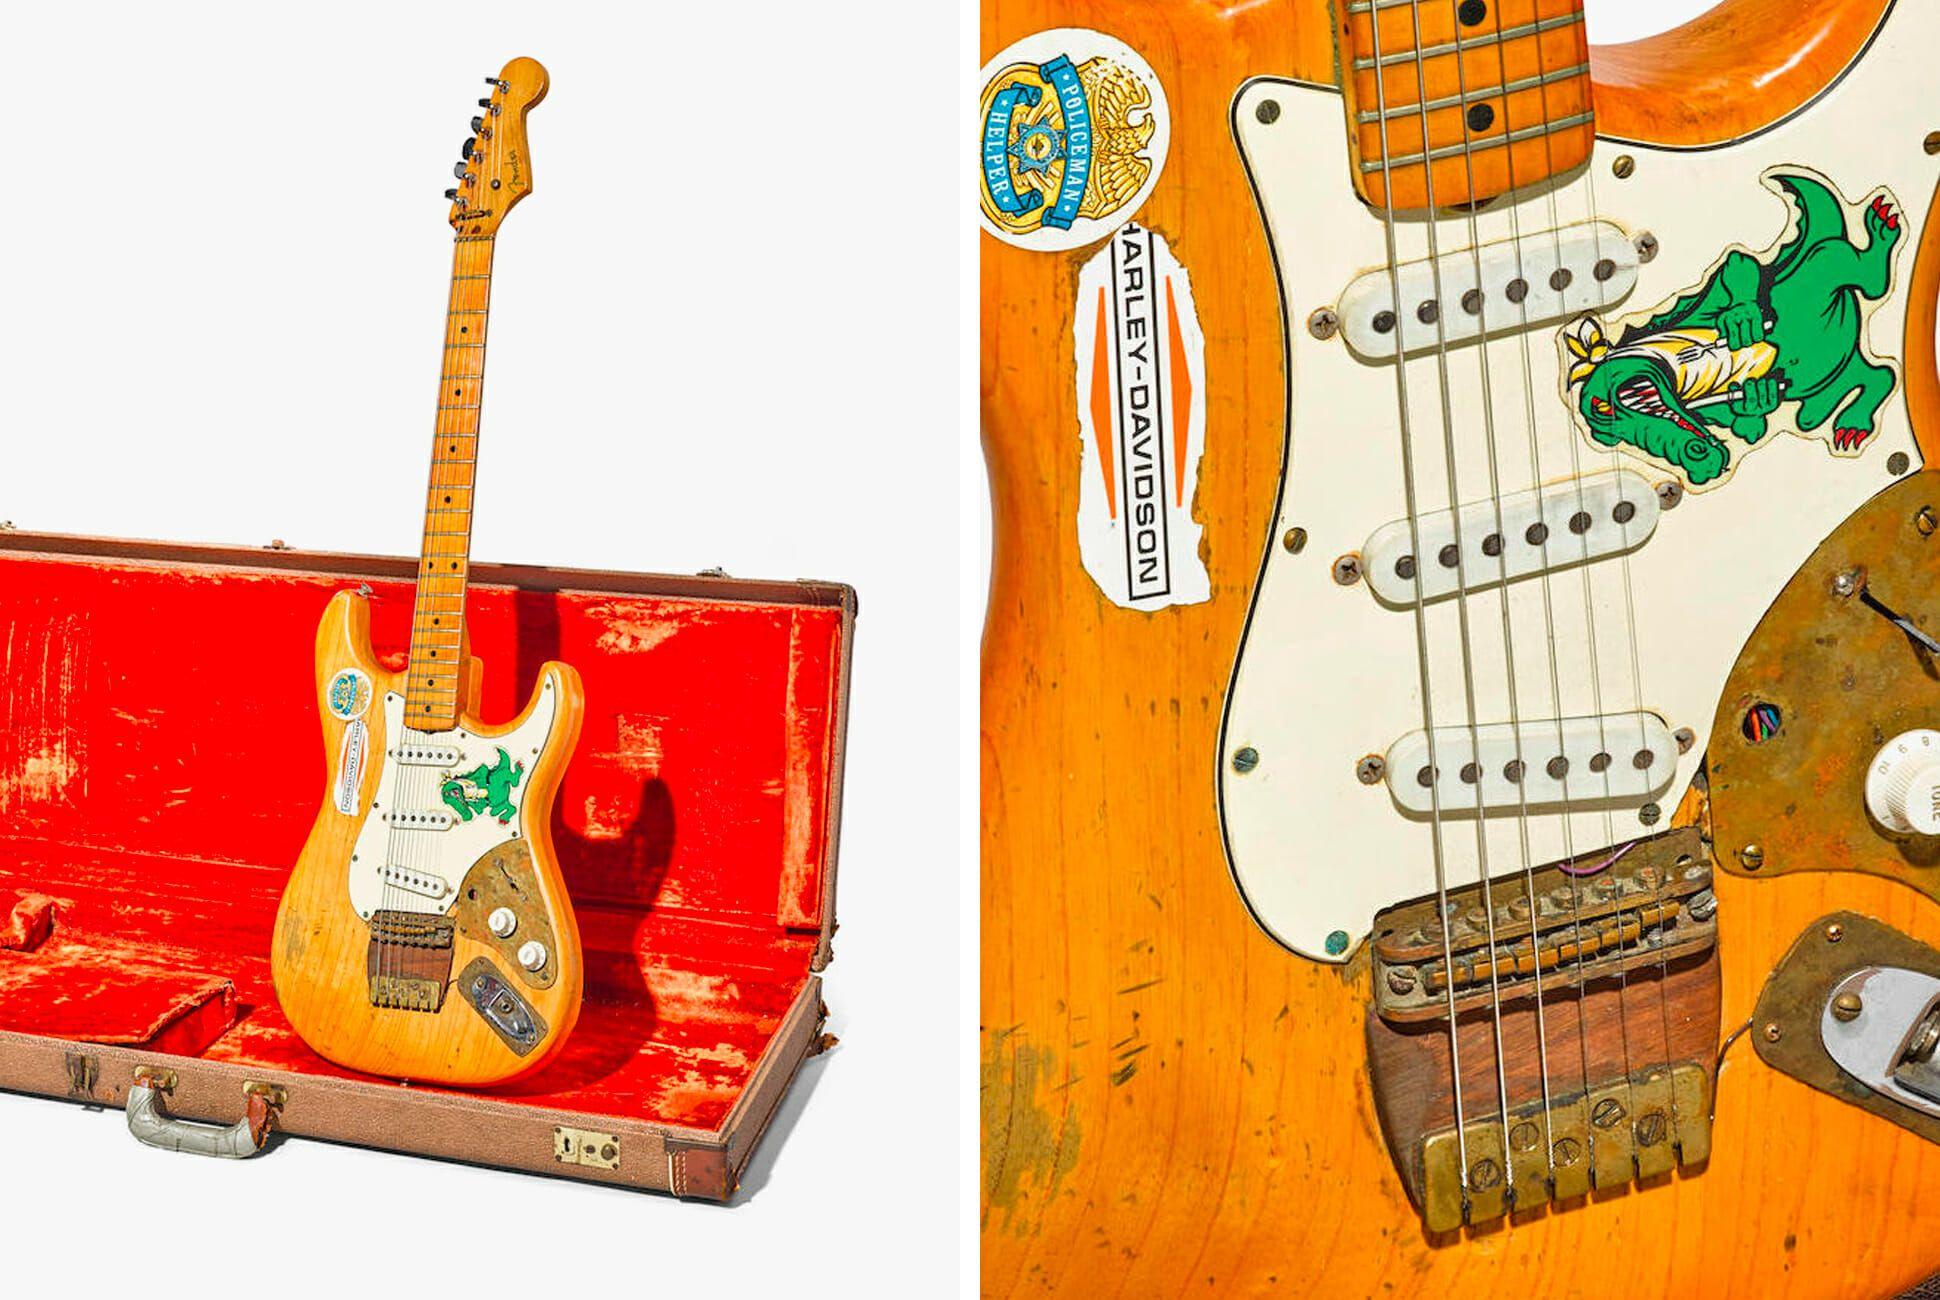 jerry garcia 39 s heavily modified fender guitar is up for sale gear patrol. Black Bedroom Furniture Sets. Home Design Ideas